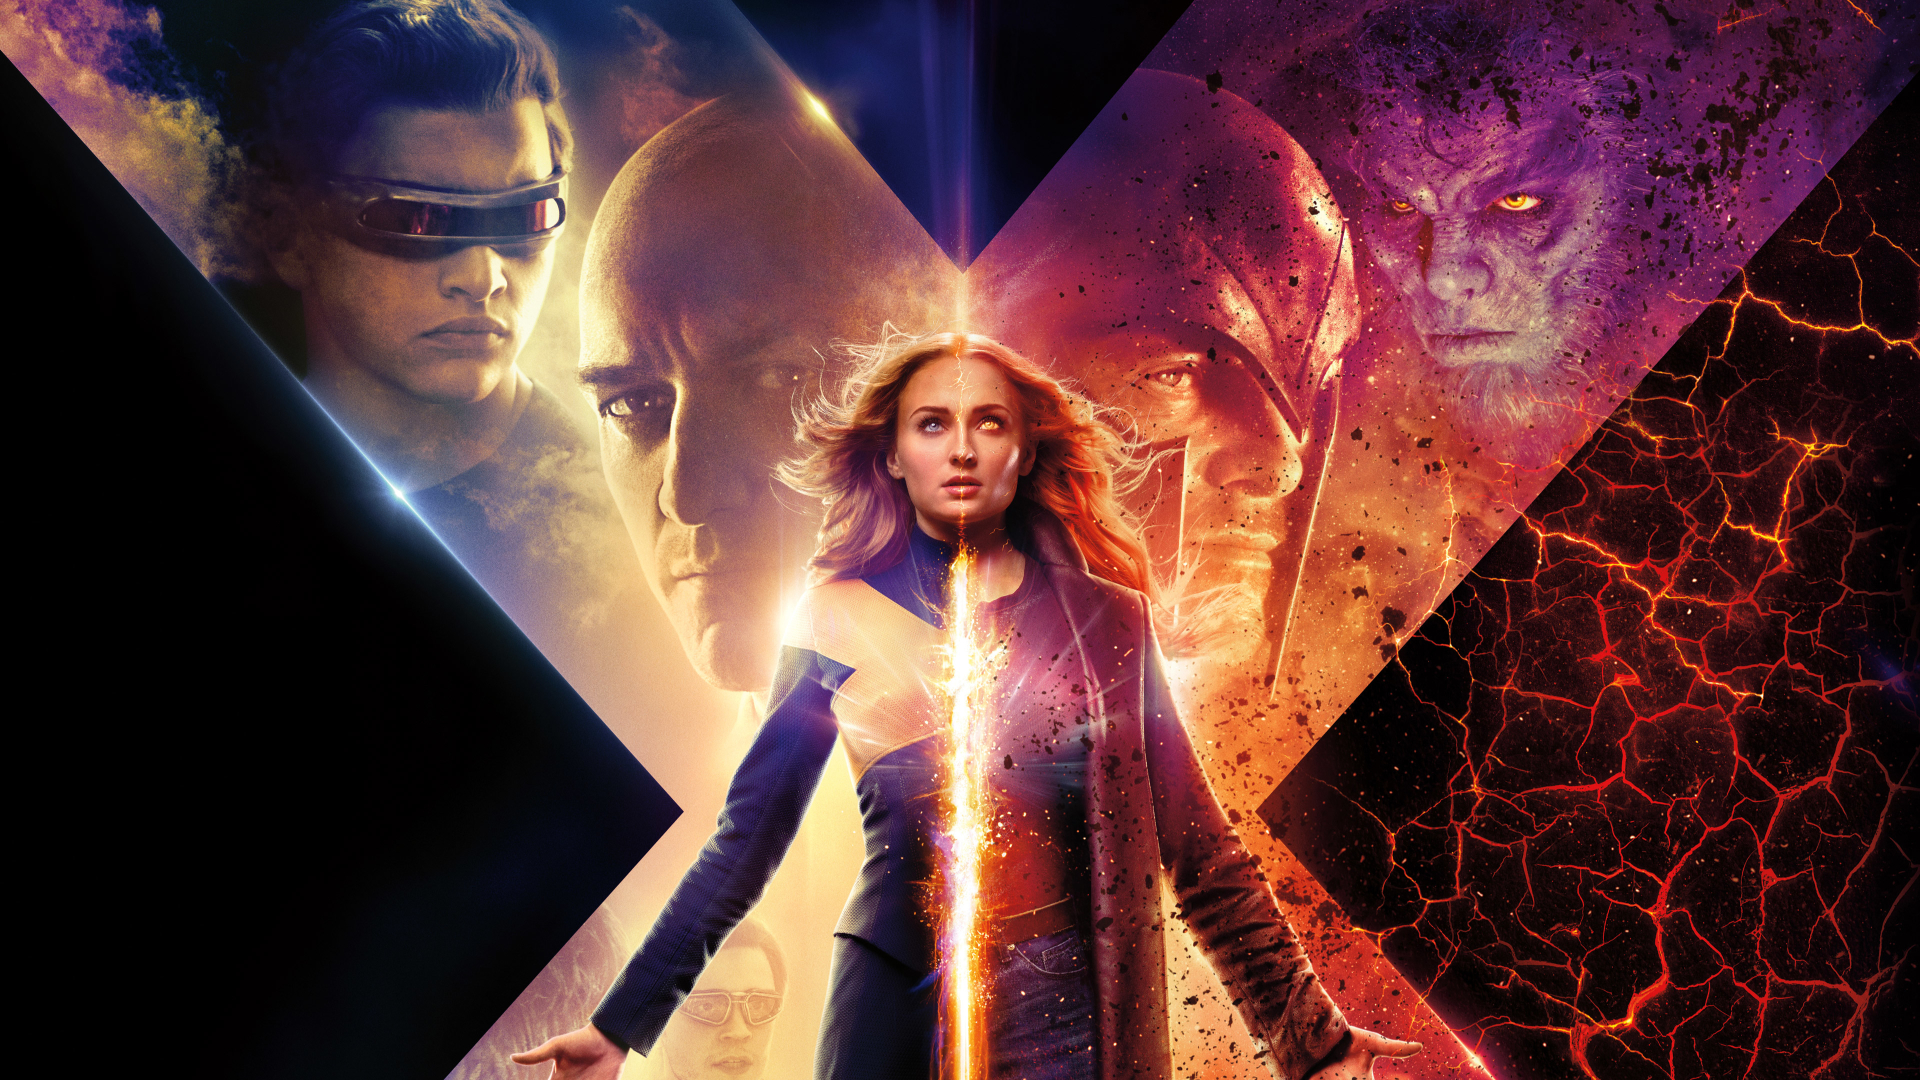 1920x1080 X-Men Dark Phoenix 2019 Movie New Poster 1080P Laptop Full